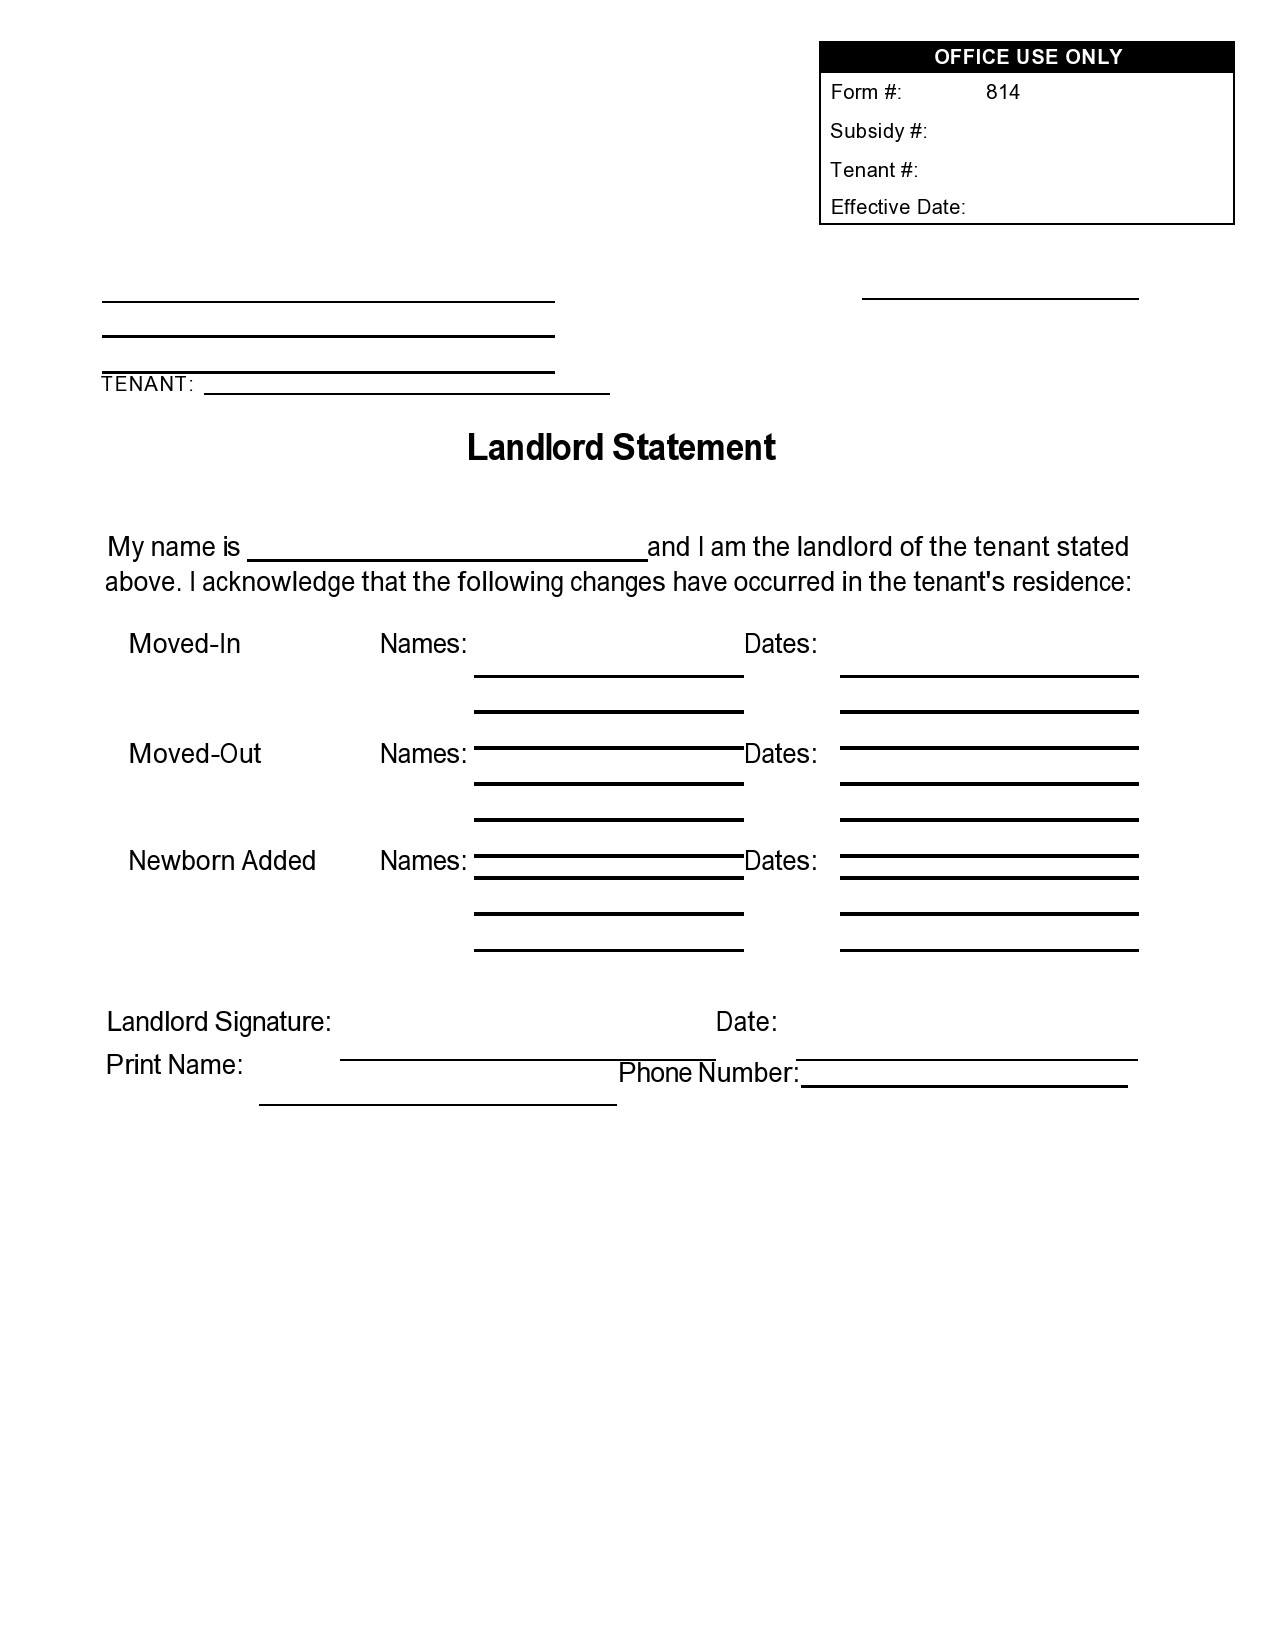 Free landlord statment 32